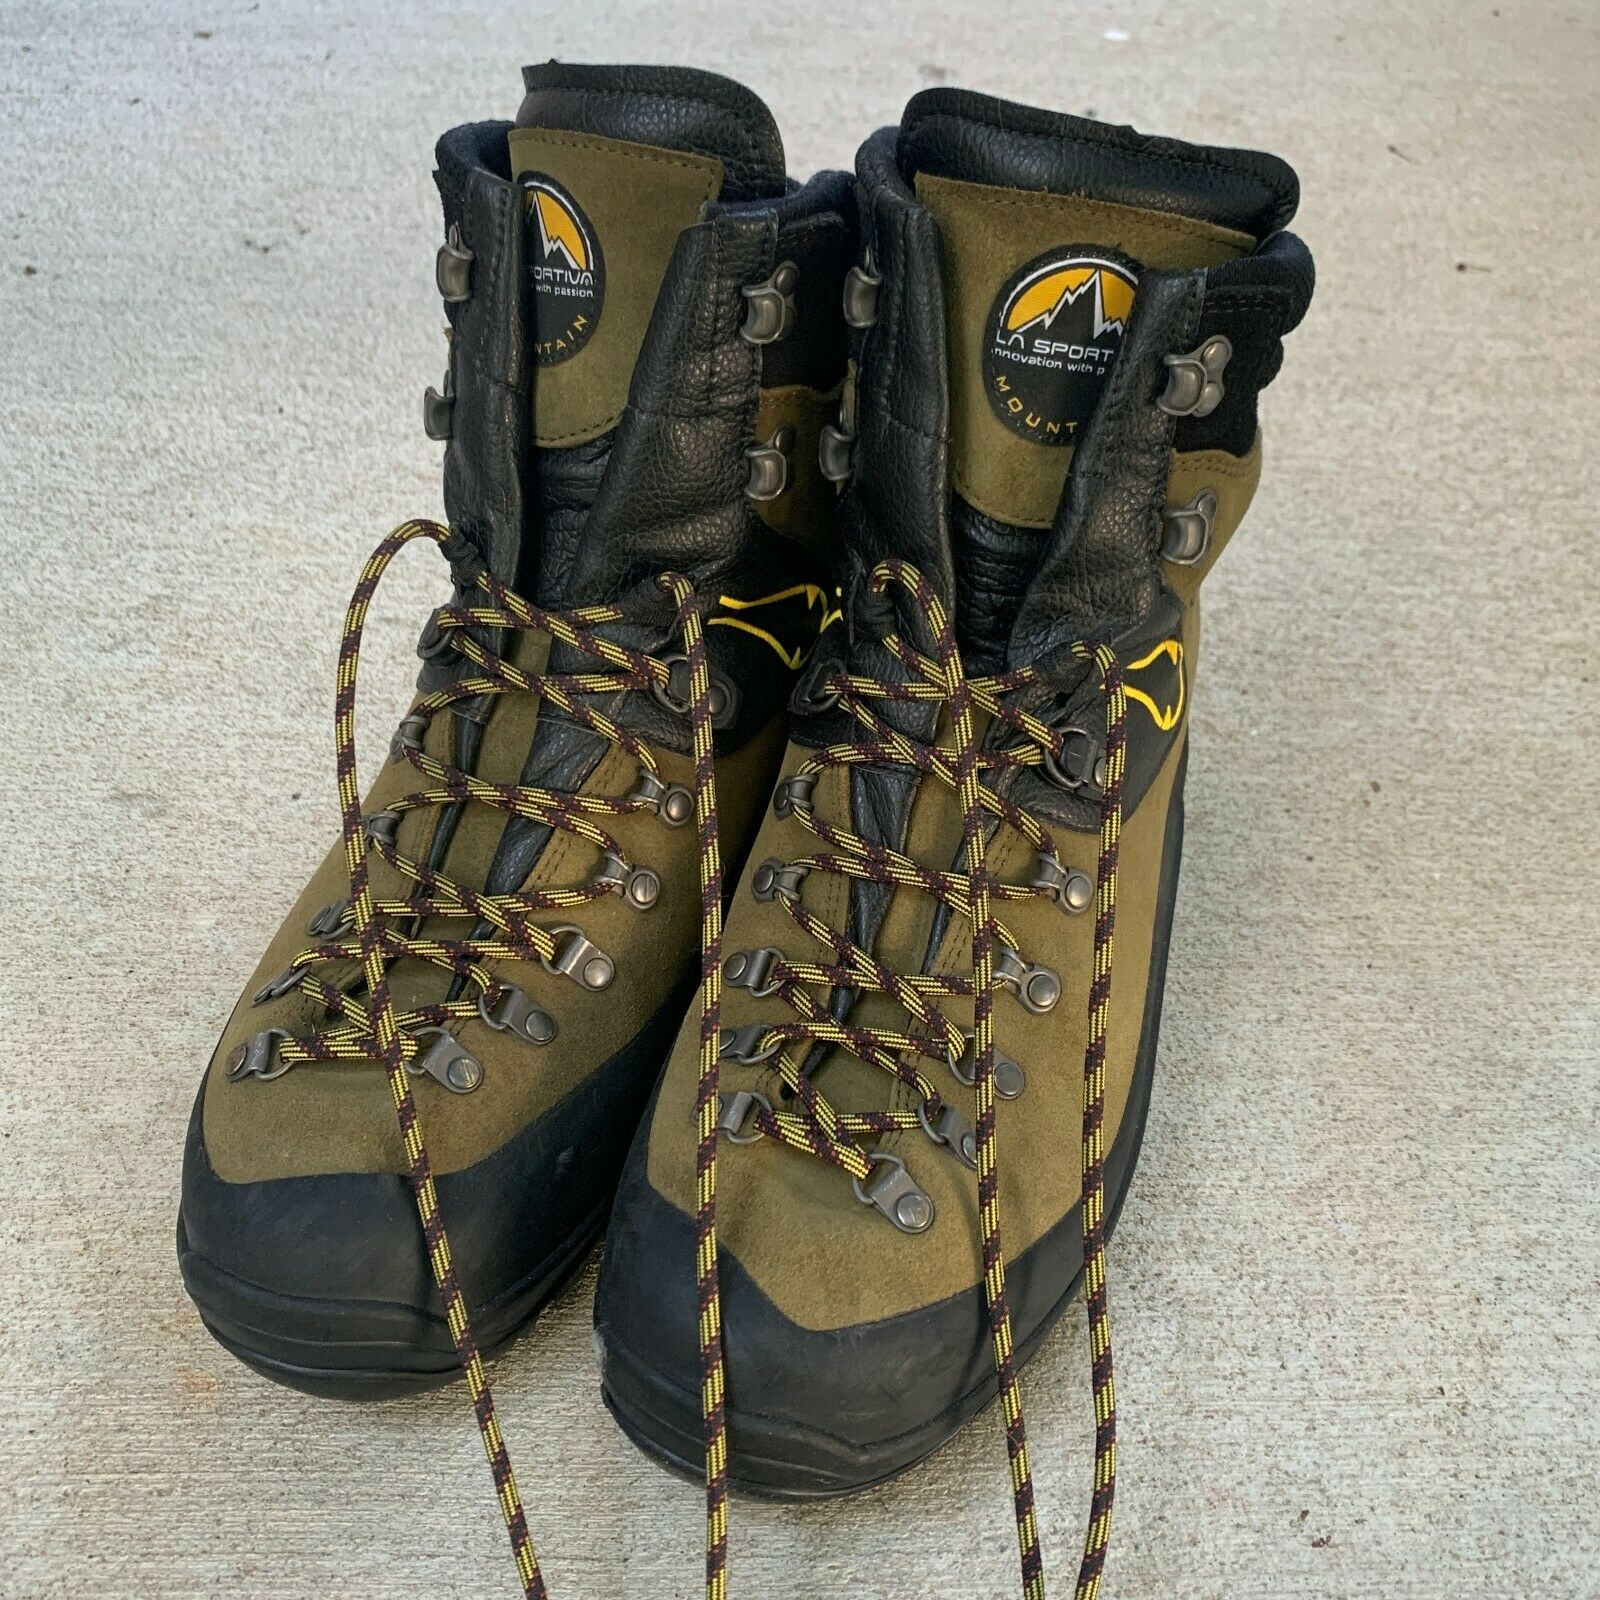 La Sportiva Karakorum Mountaining Stiefel Herren 11, European Größe 44.5